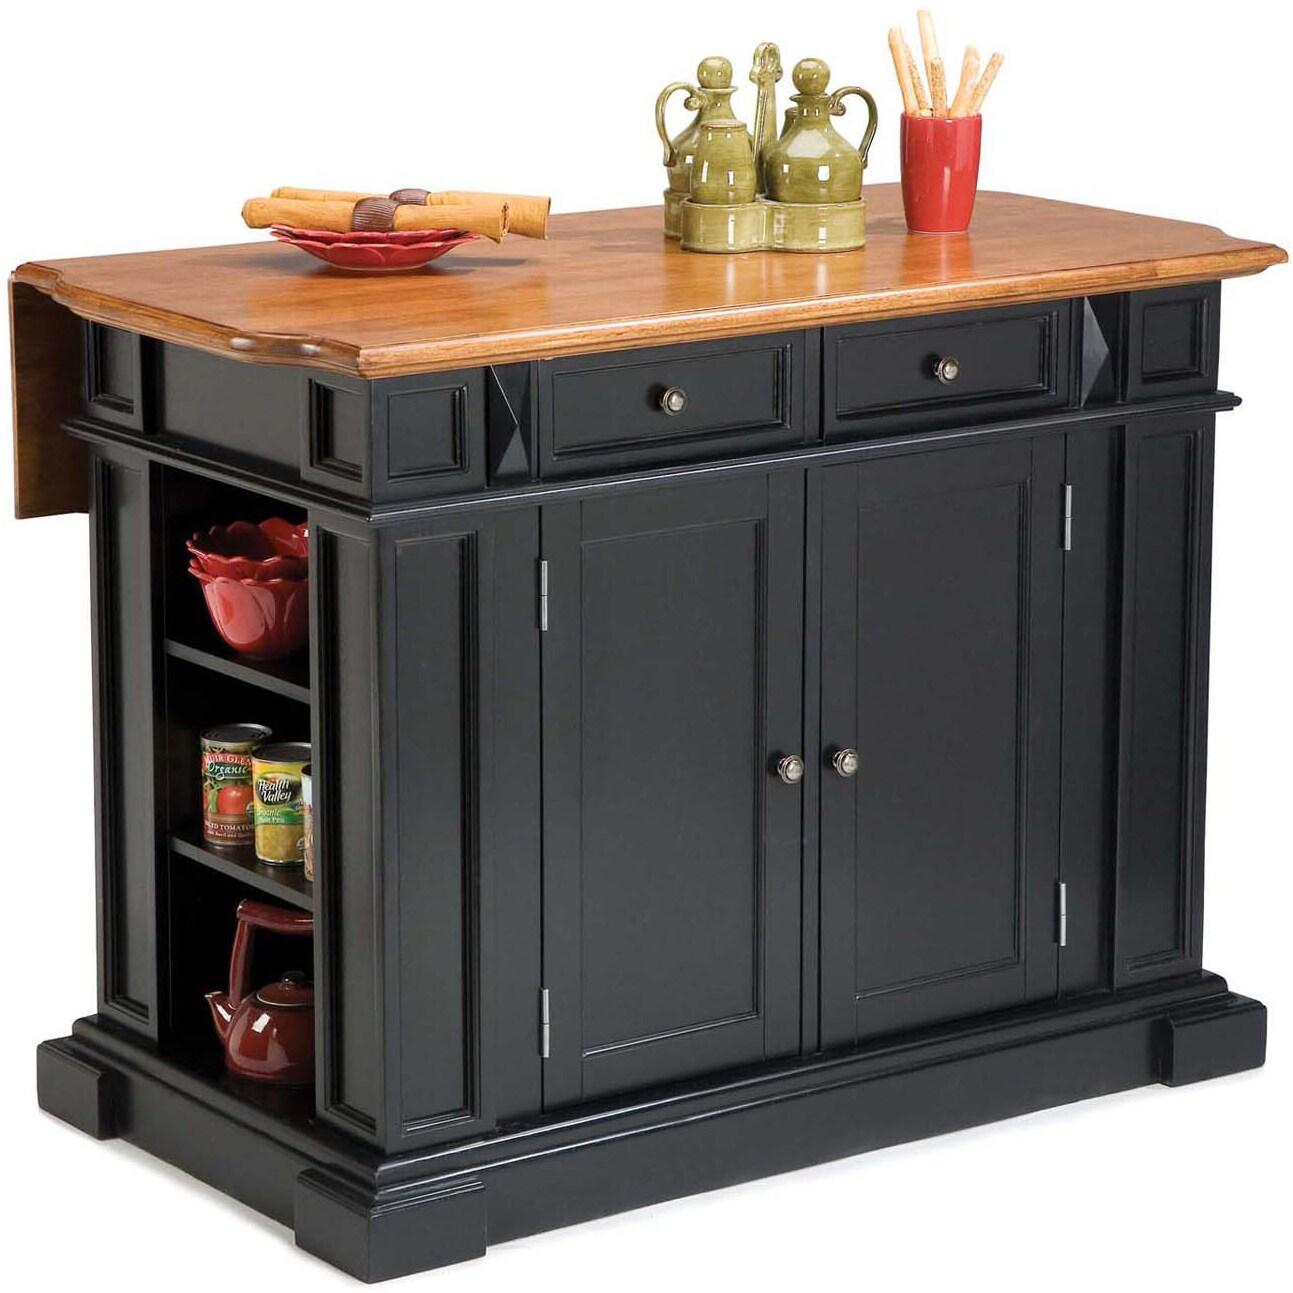 Black Distressed Oak Kitchen Island by Home Styles (Kitch...